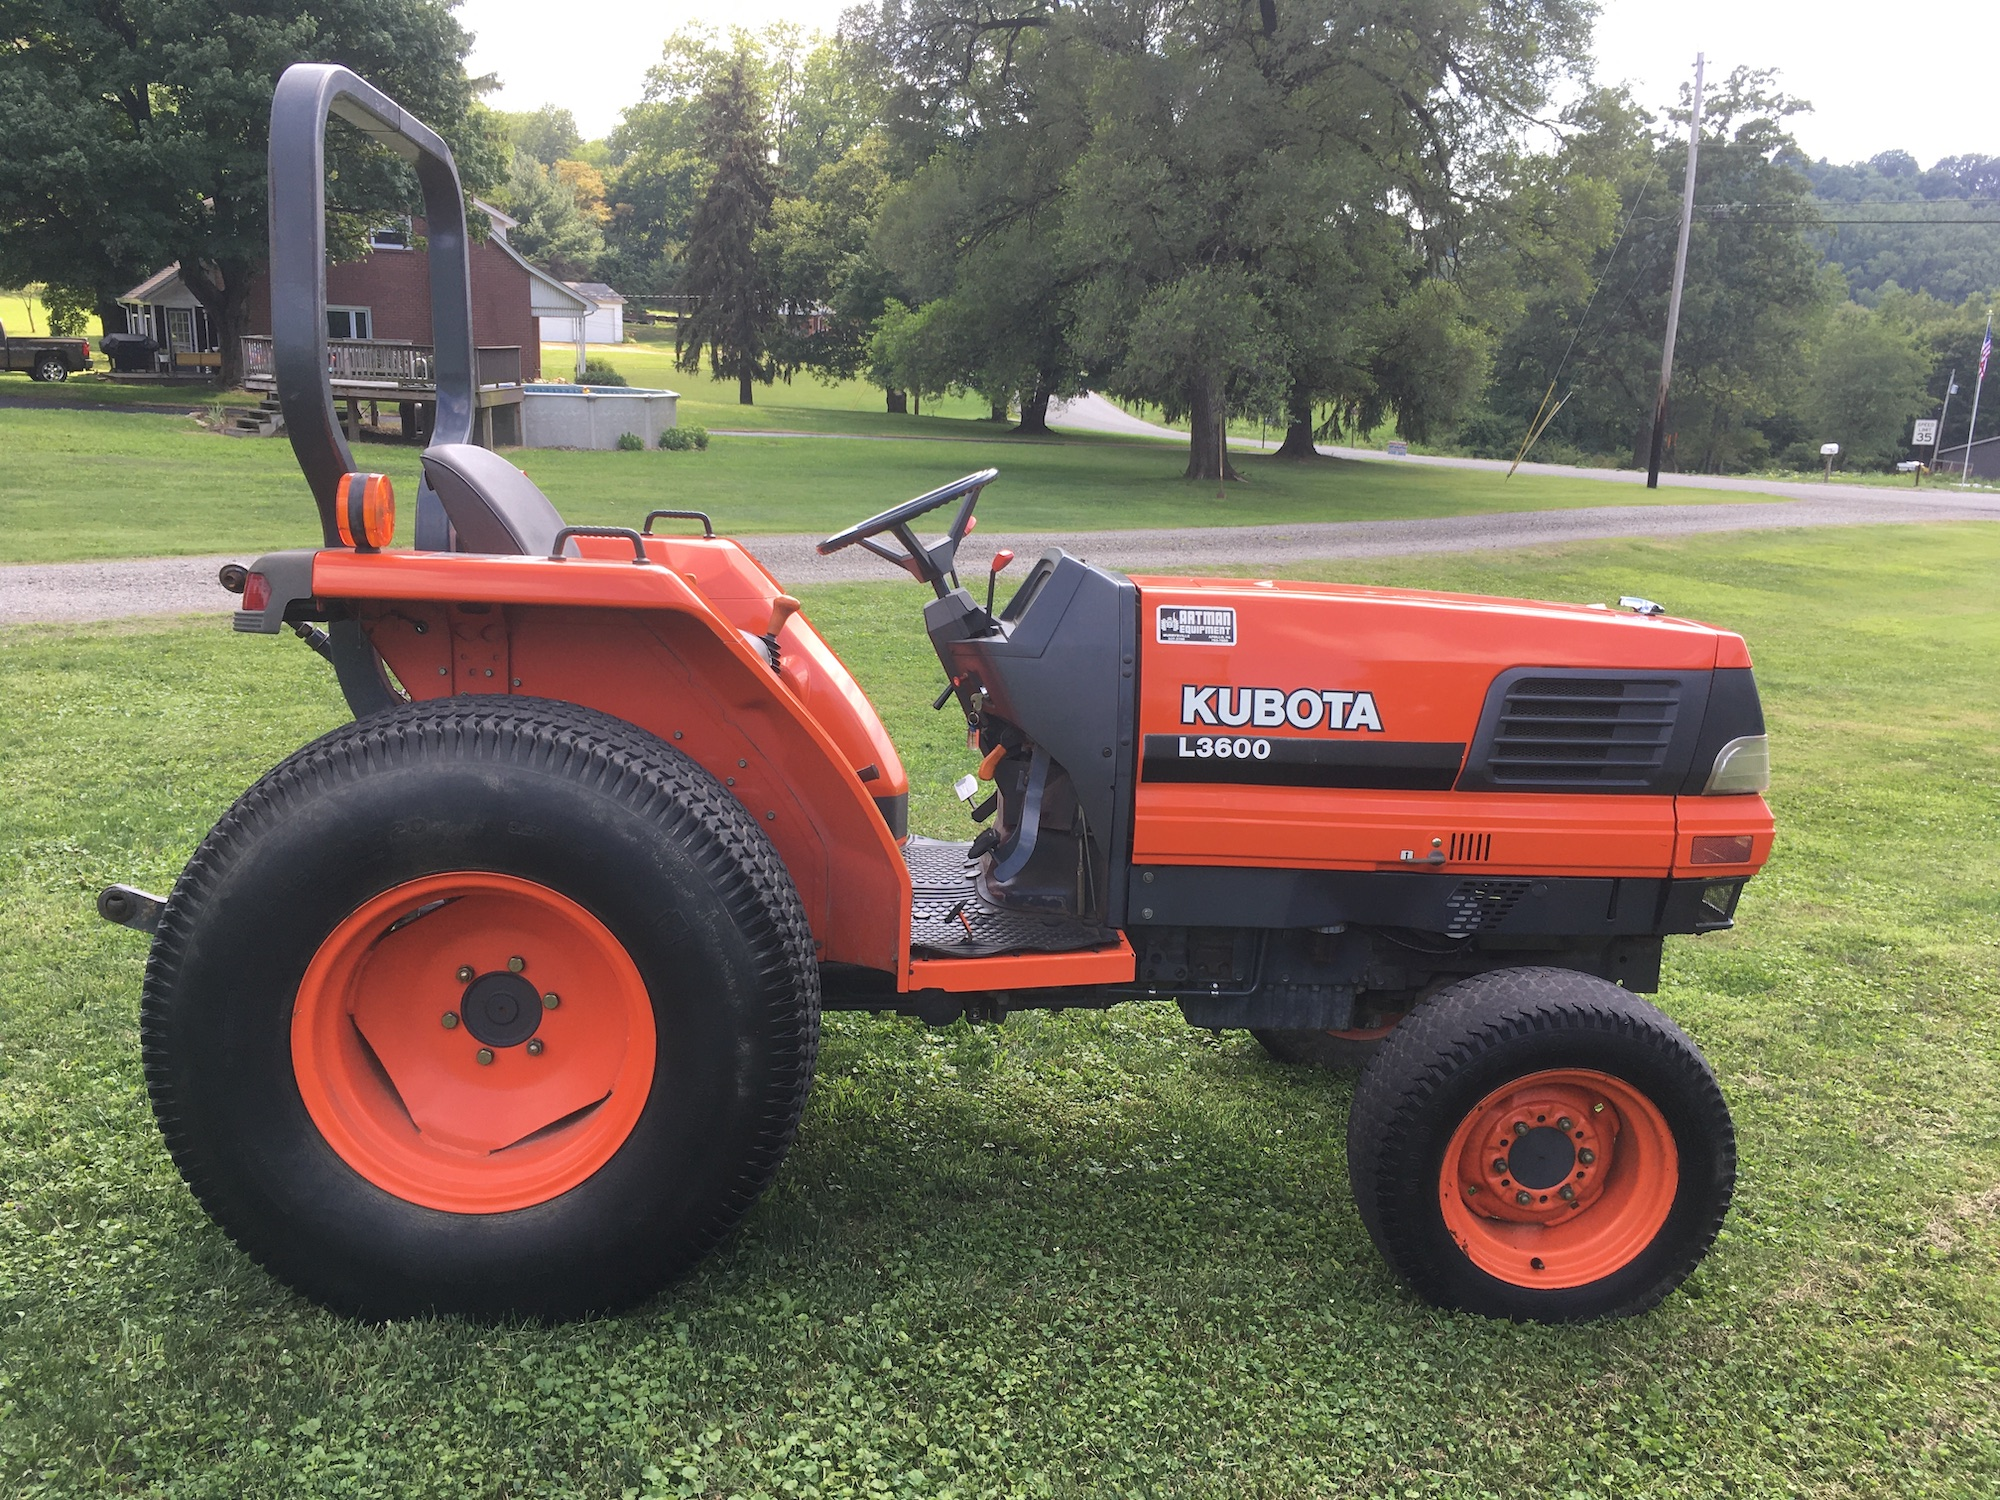 Kubota-L3600-Tractor-03